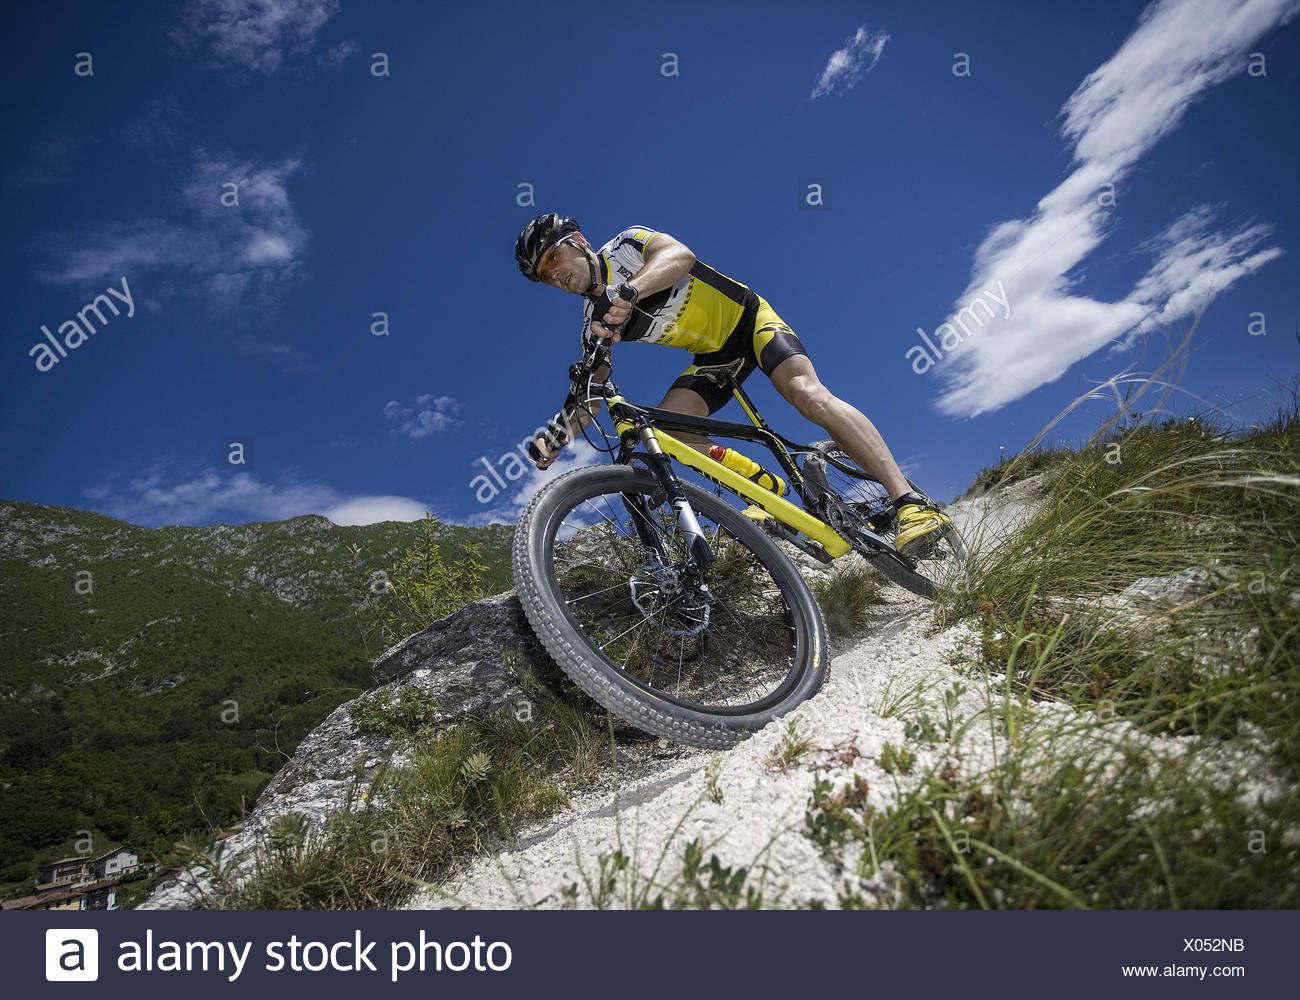 Mann Mit Mountainbike Im Gebirge (Model-Release) Stockbild